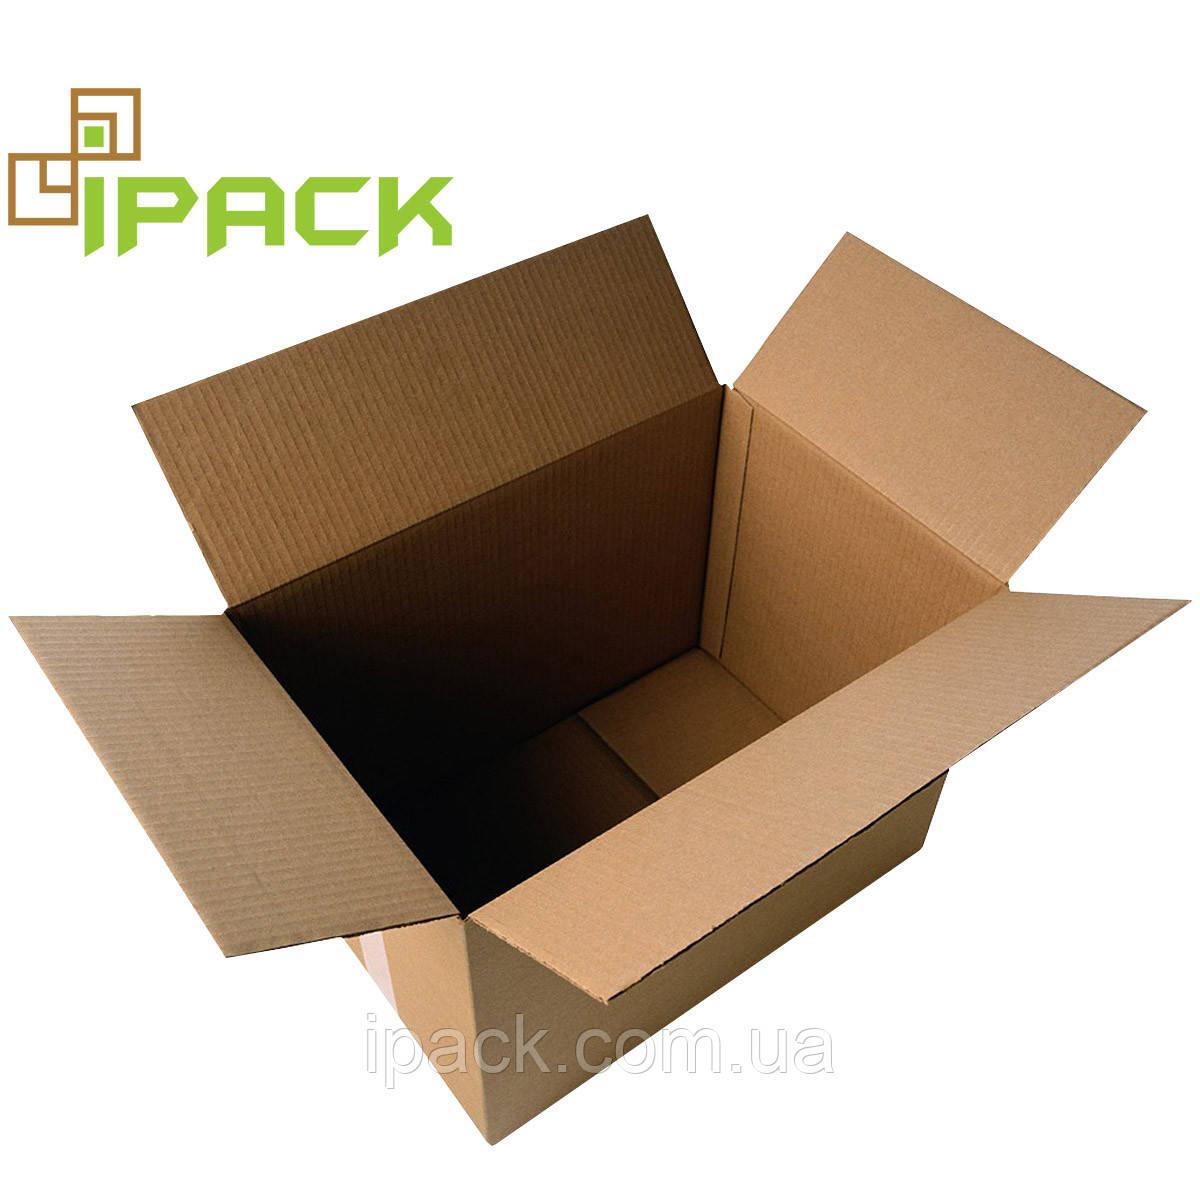 Гофроящик 260*210*210 мм бурий четырехклапанный картонний короб